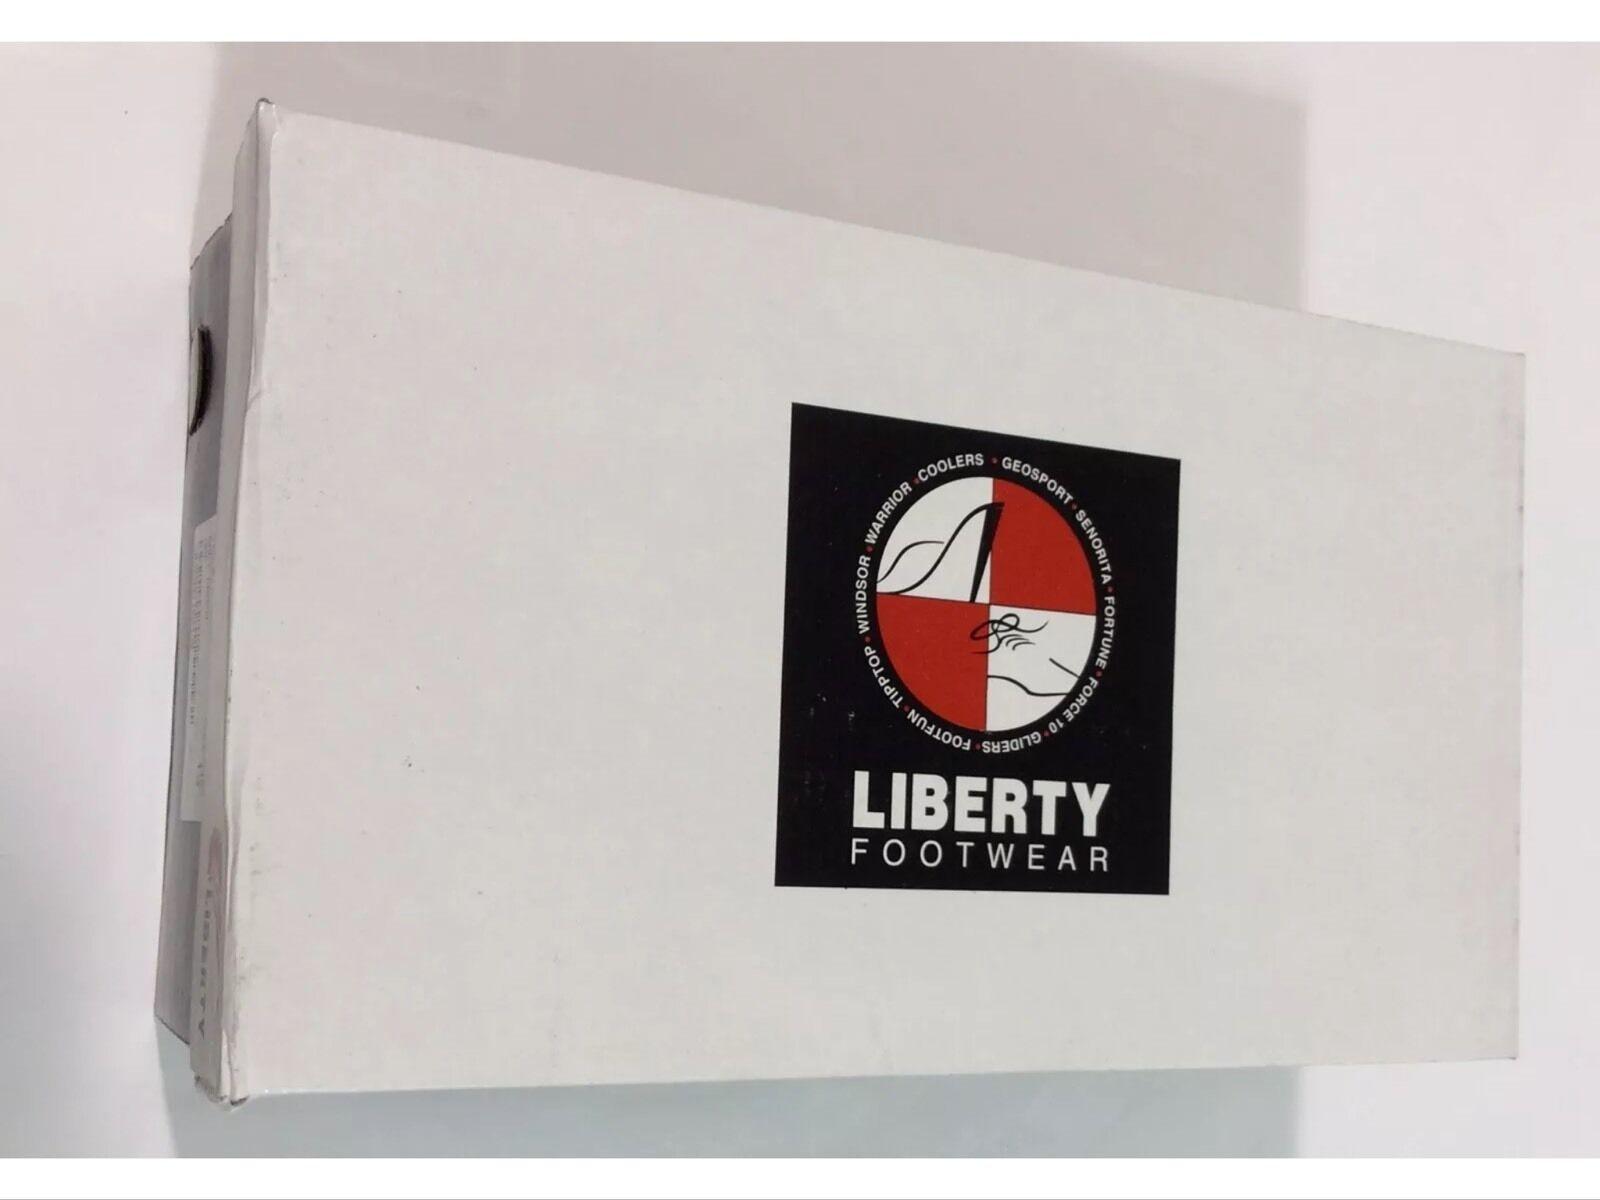 Herren Formelle Schuhe Liberty Liberty Liberty Leder Oben Oxford Marineblau Flügelspitze, Neu & 0ae59d